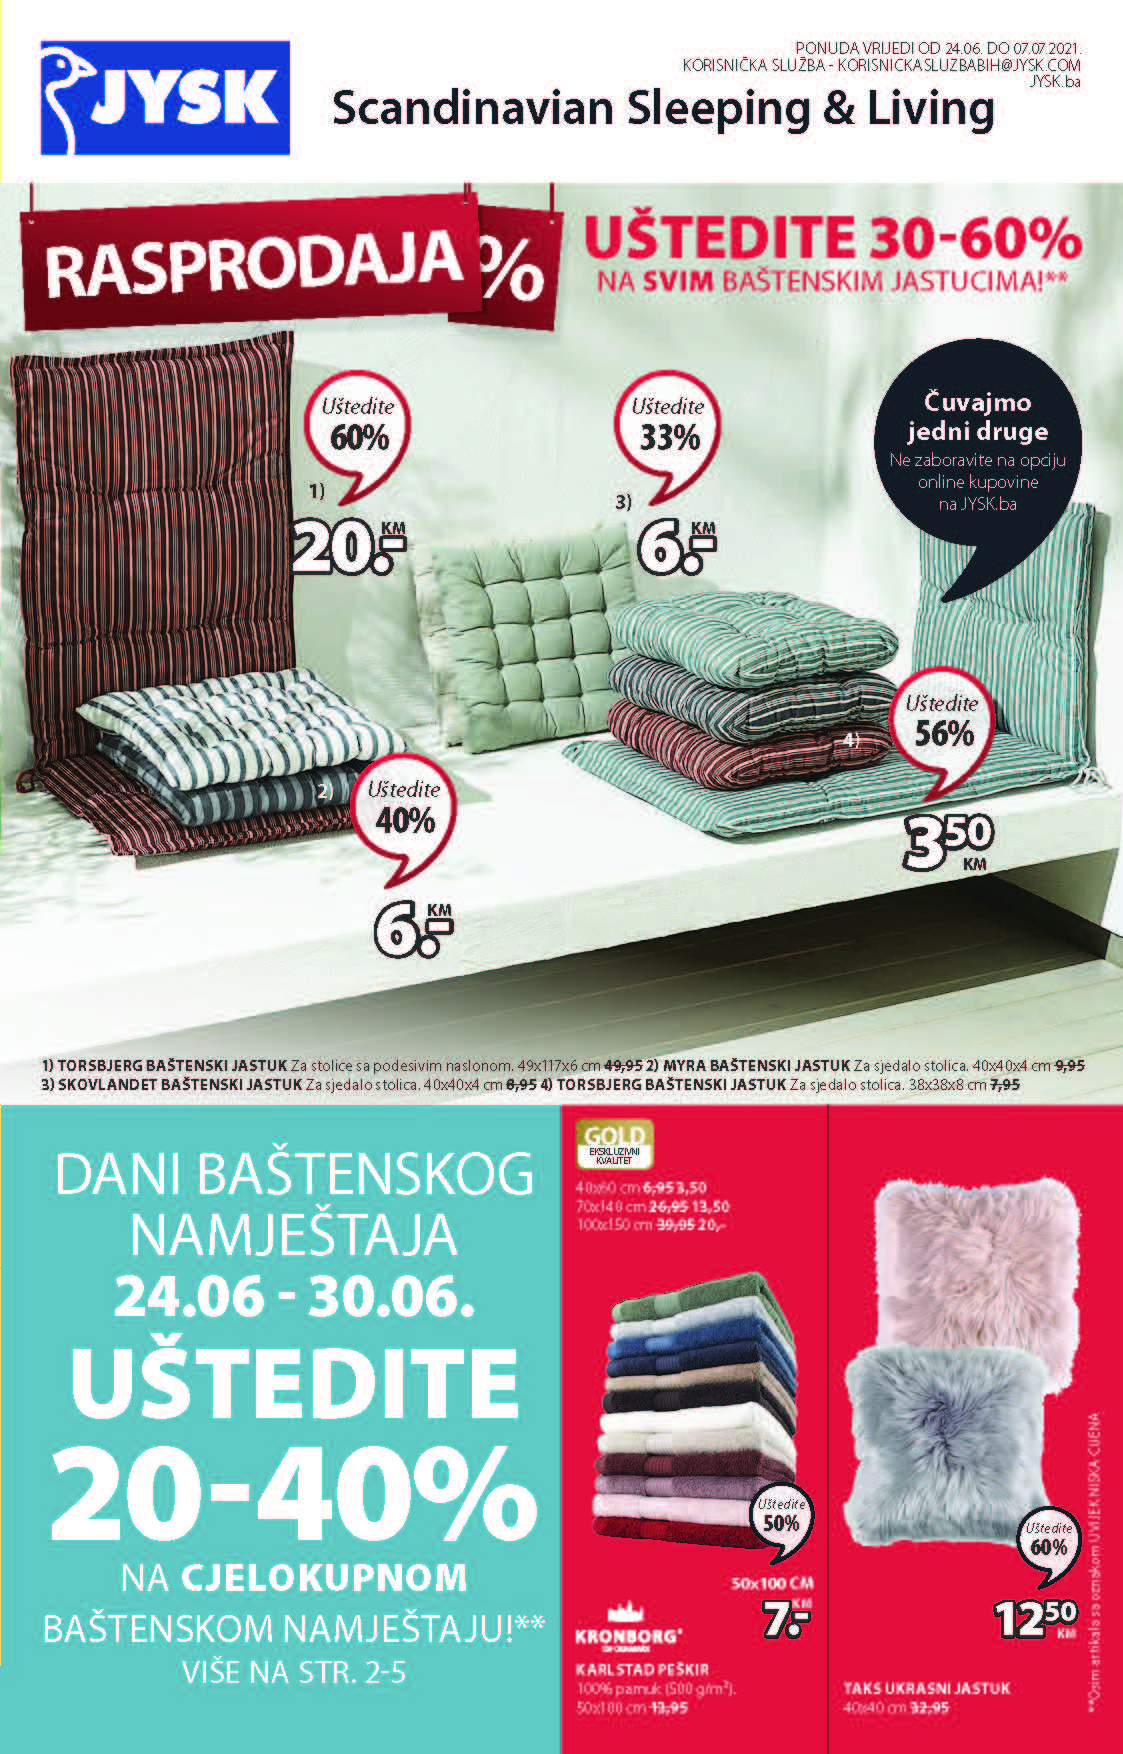 JYSK Katalog Akcijska rasprodaja JUN JUL 2021 24.6. 7.7. Page 02 1